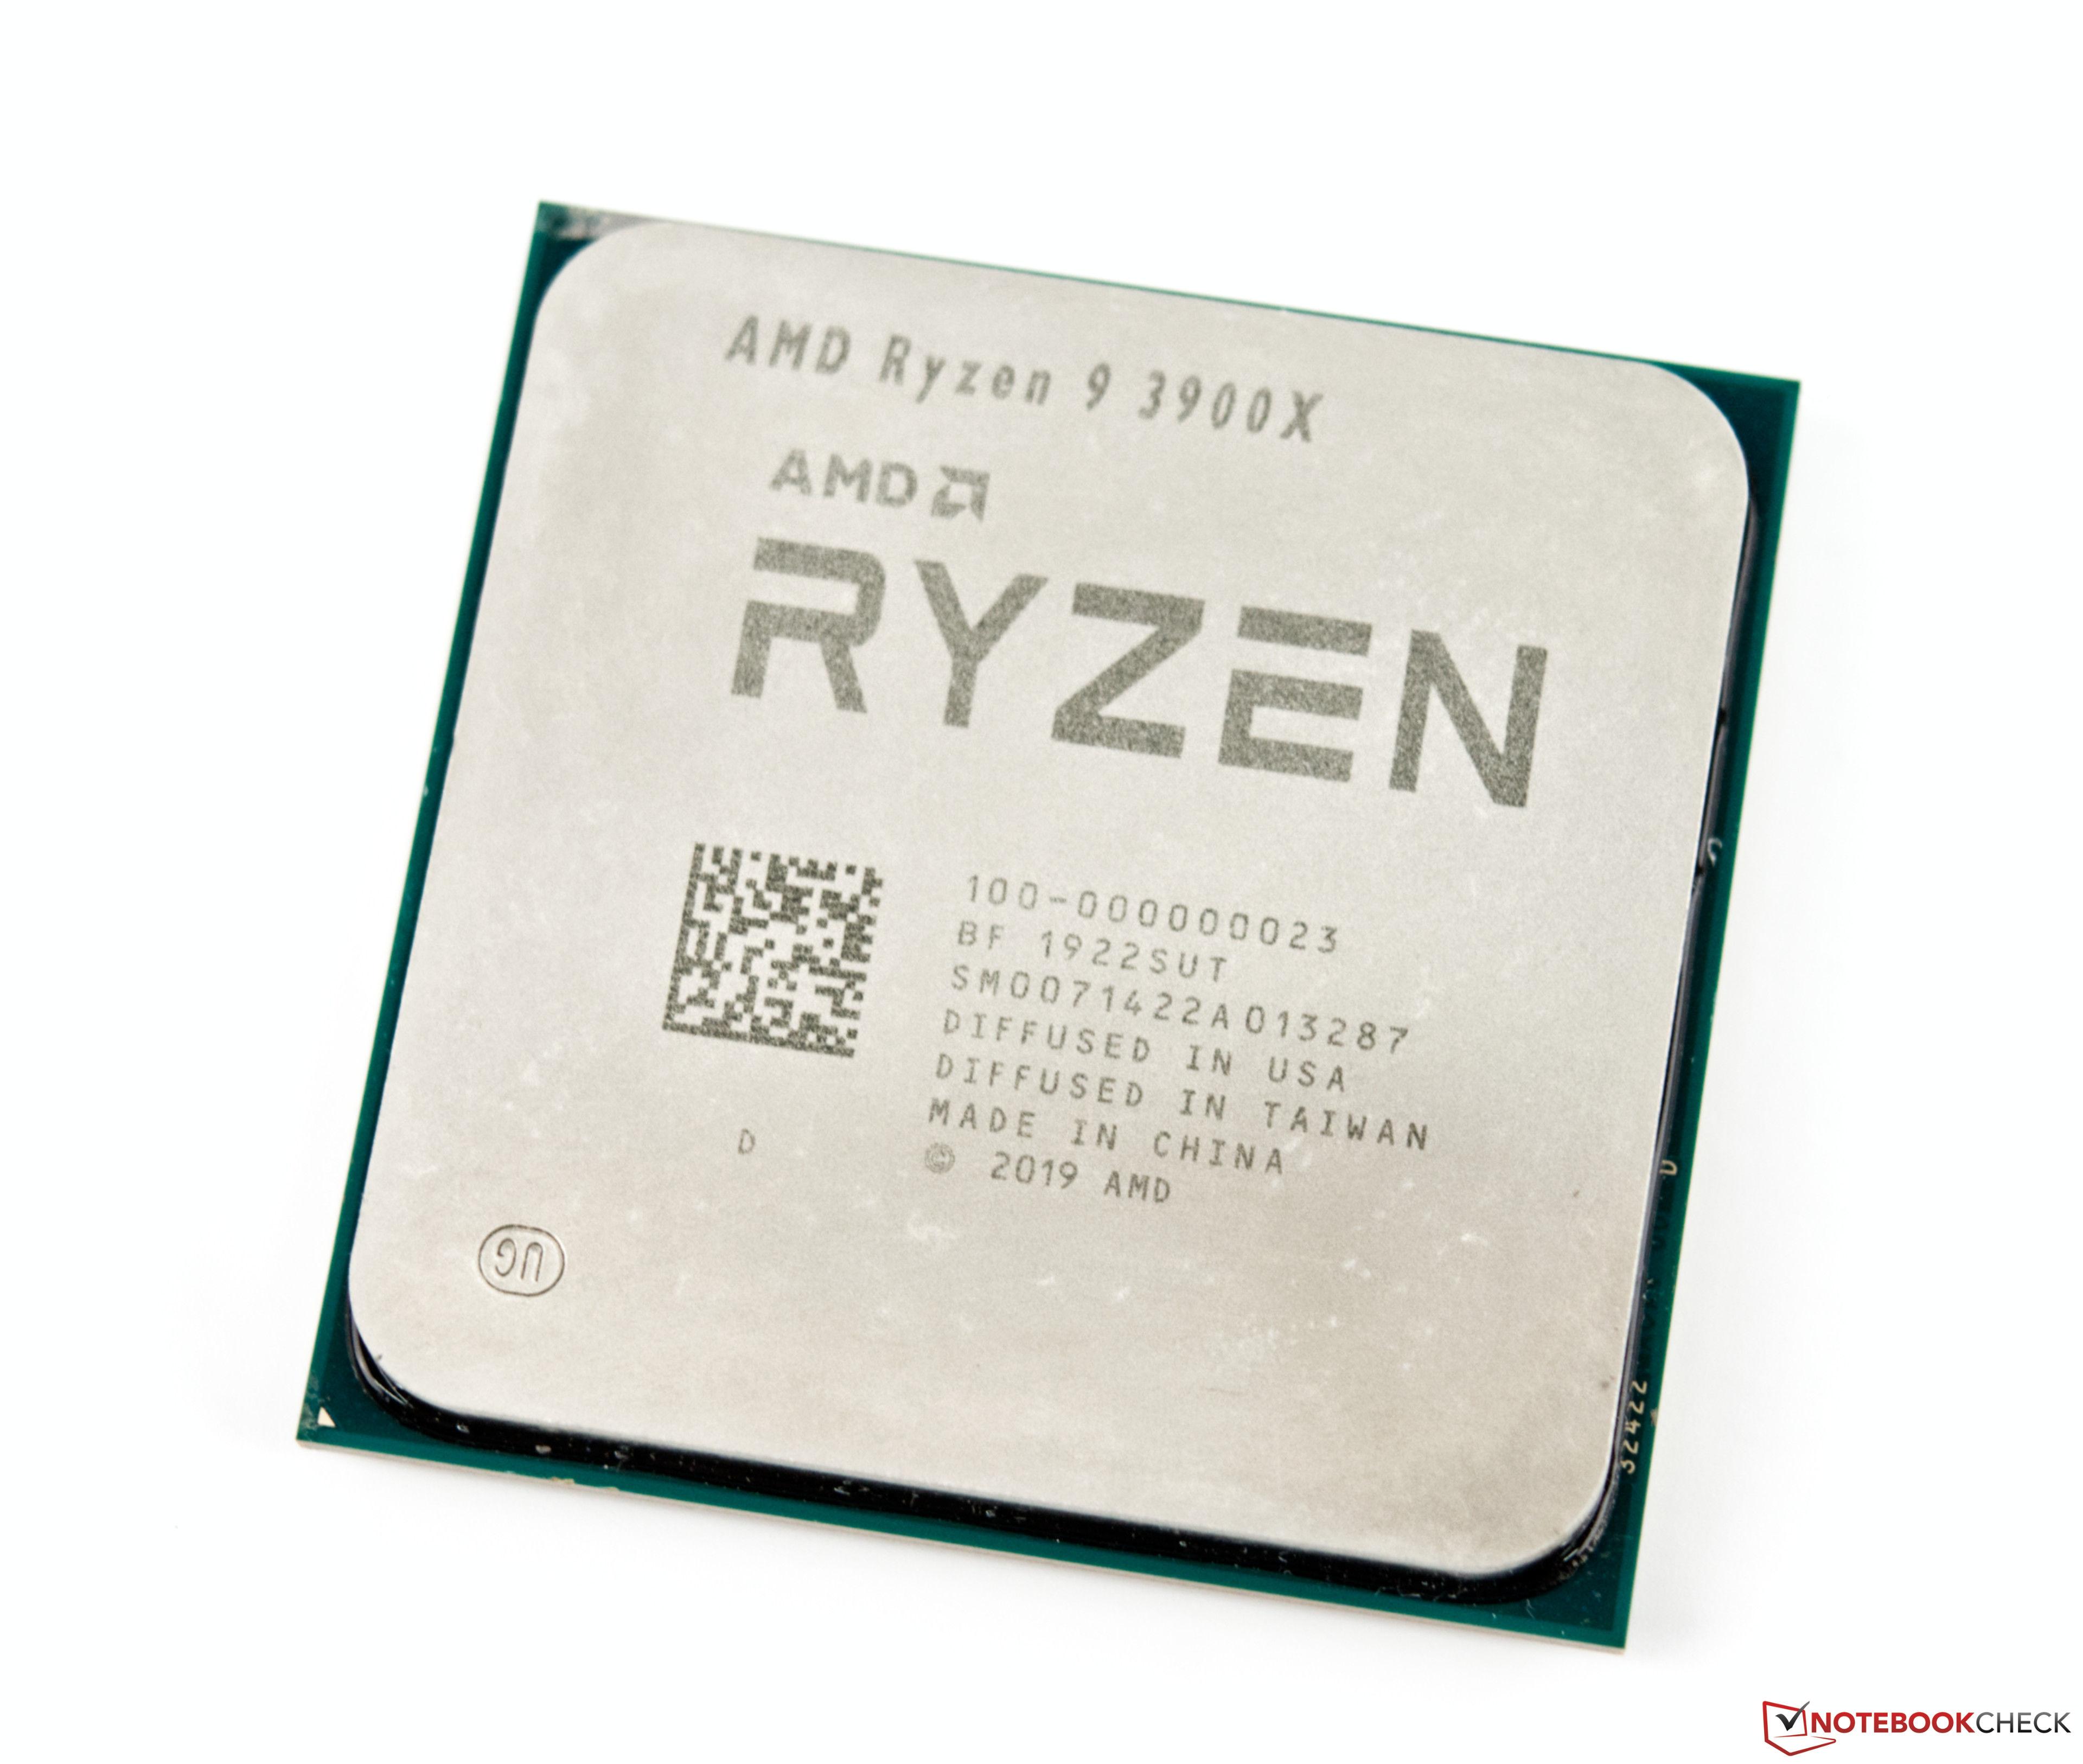 AMD Ryzen 9 3900X Desktop CPU Review: 12 cores meet Socket